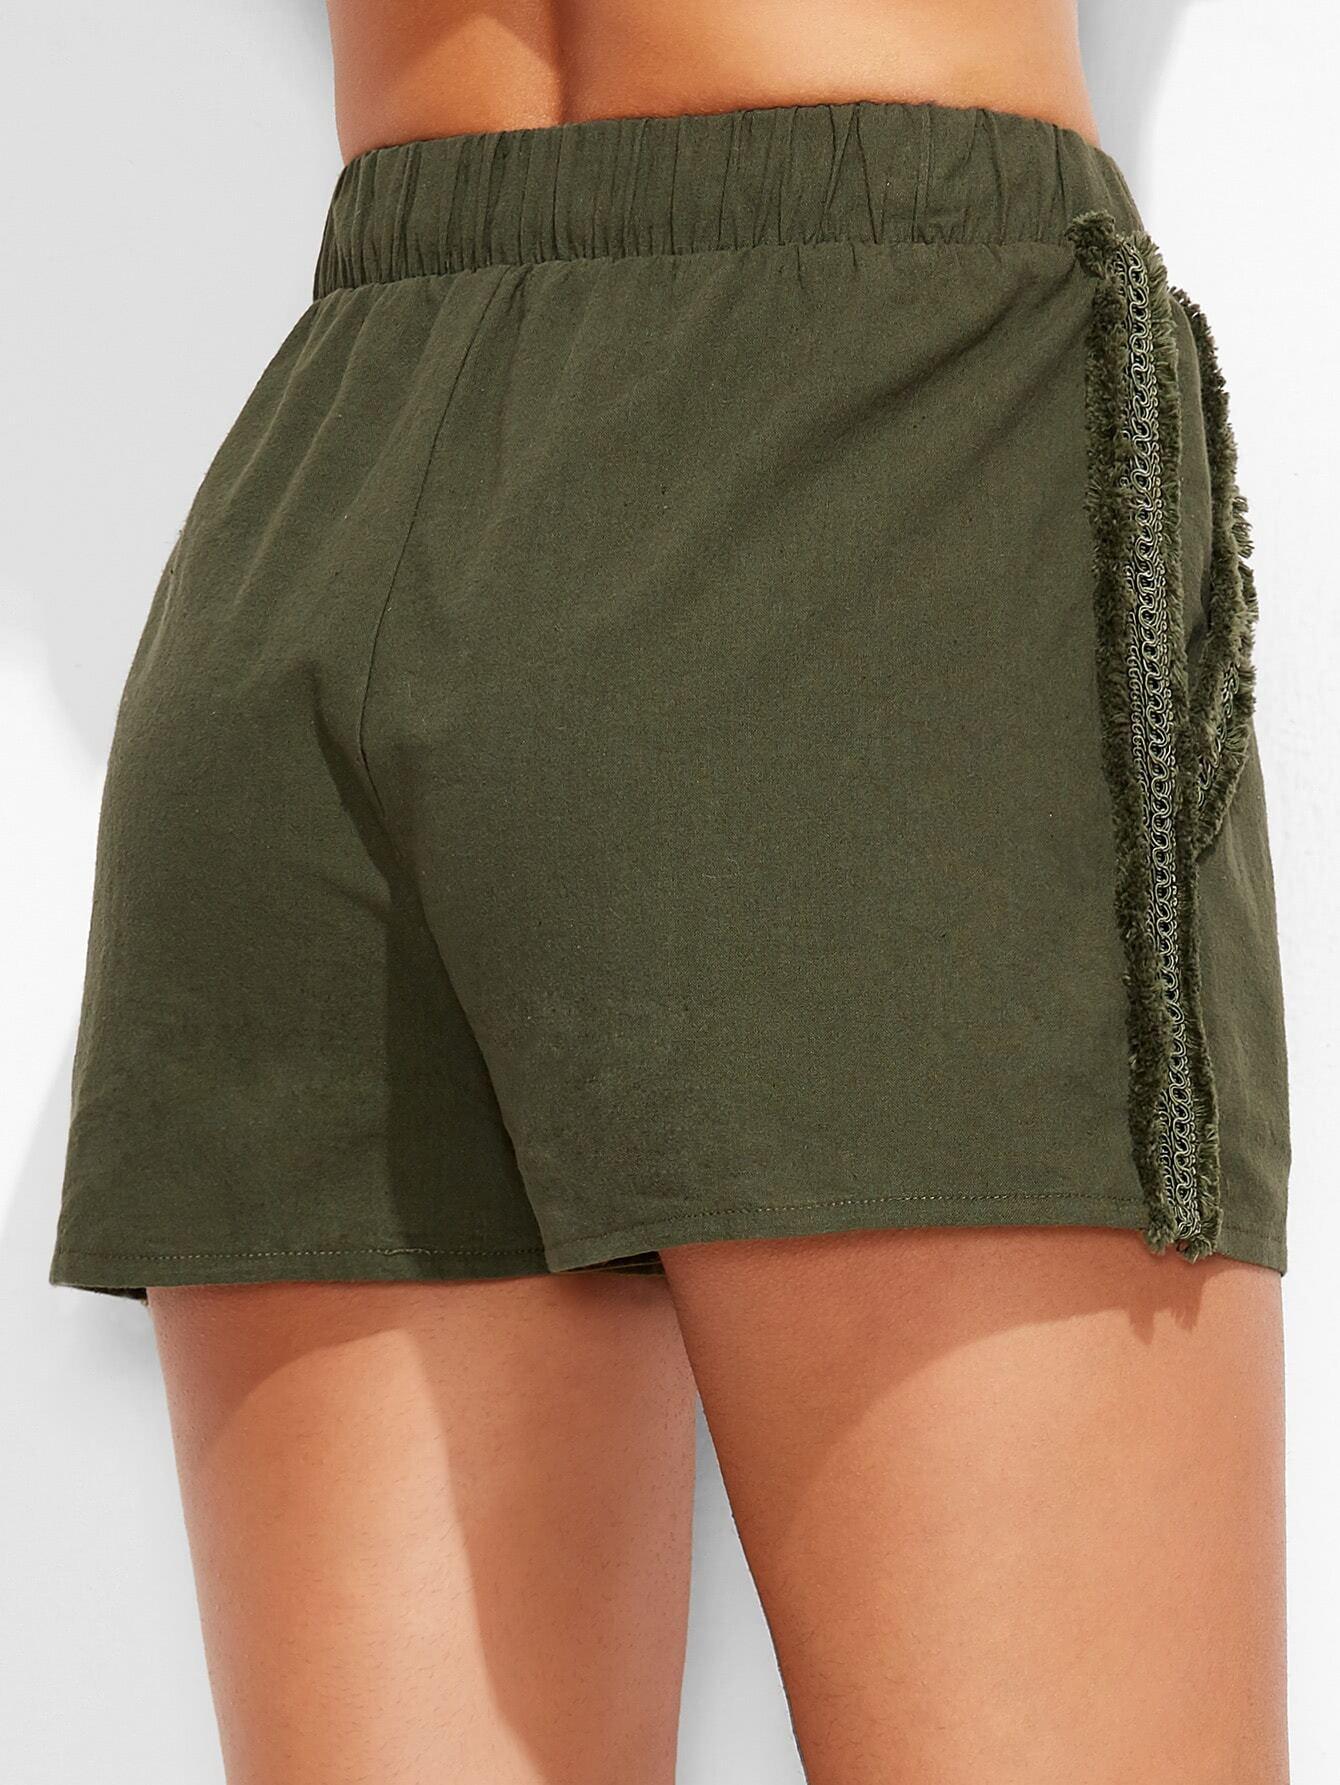 shorts161207701_2